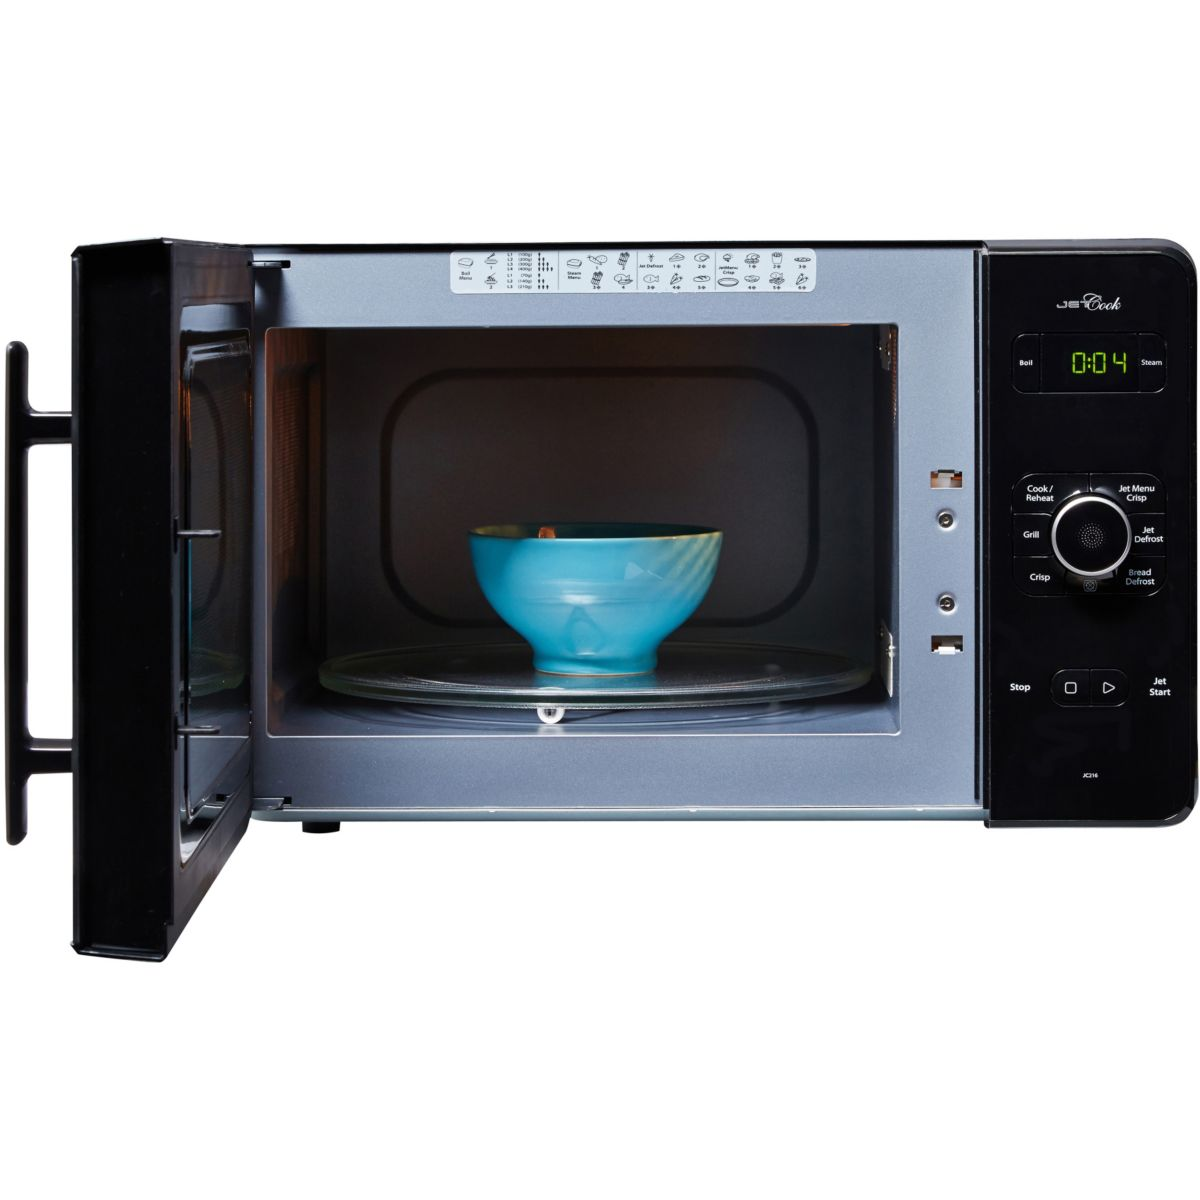 Micro-onde grill whirlpool jc216nb - 2% de remise : code gam2